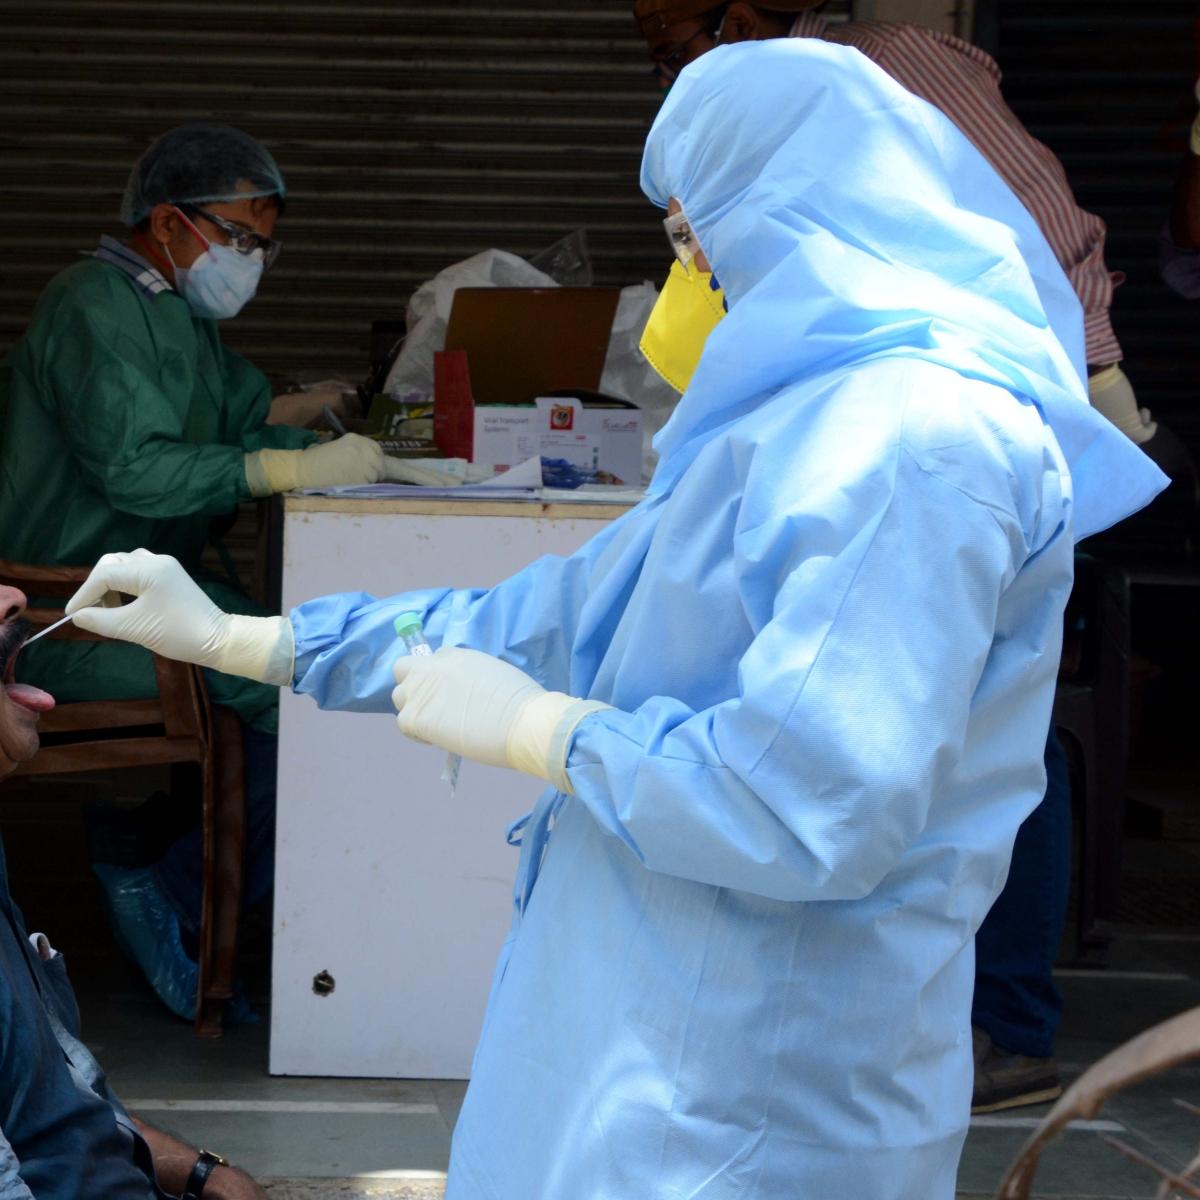 Coronavirus in Mumbai: Two SoBo high-rises sealed after 32 COVID-19 cases